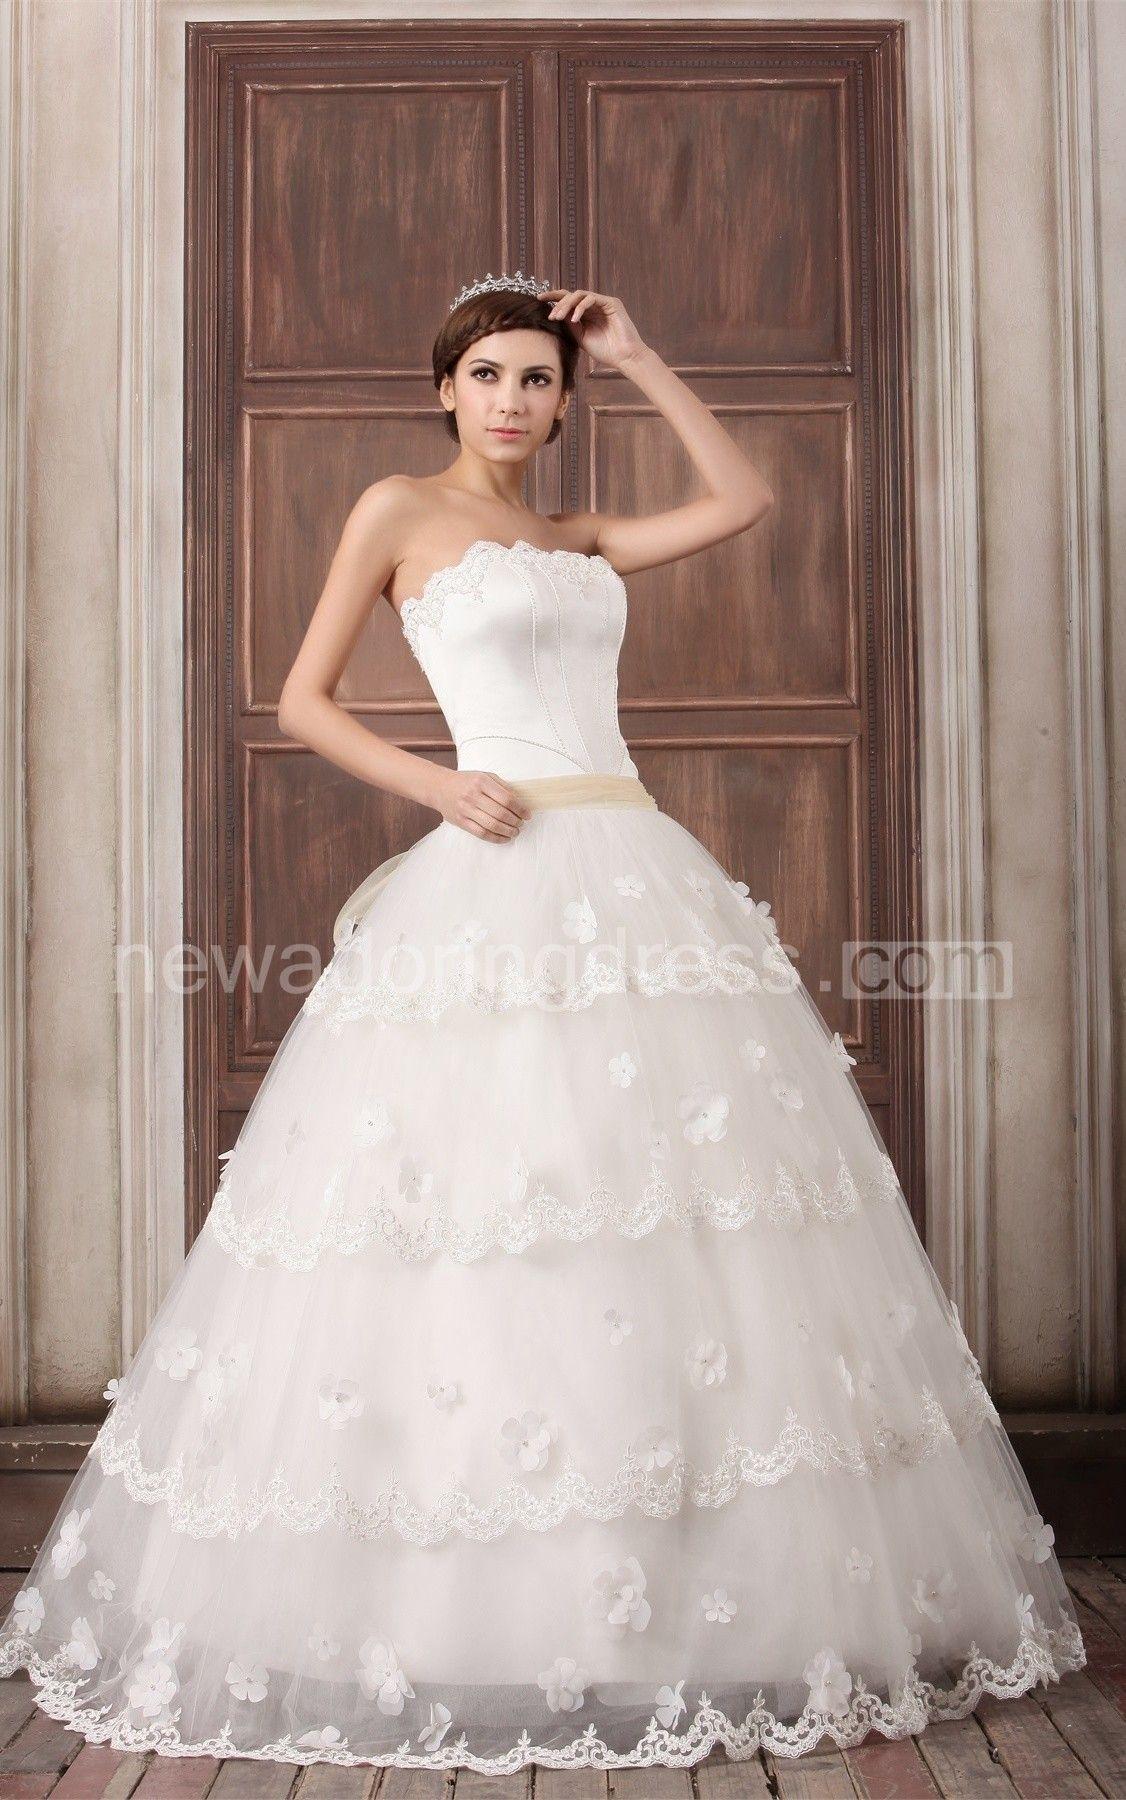 Floating princess sleeveless satin strapless wedding dresses